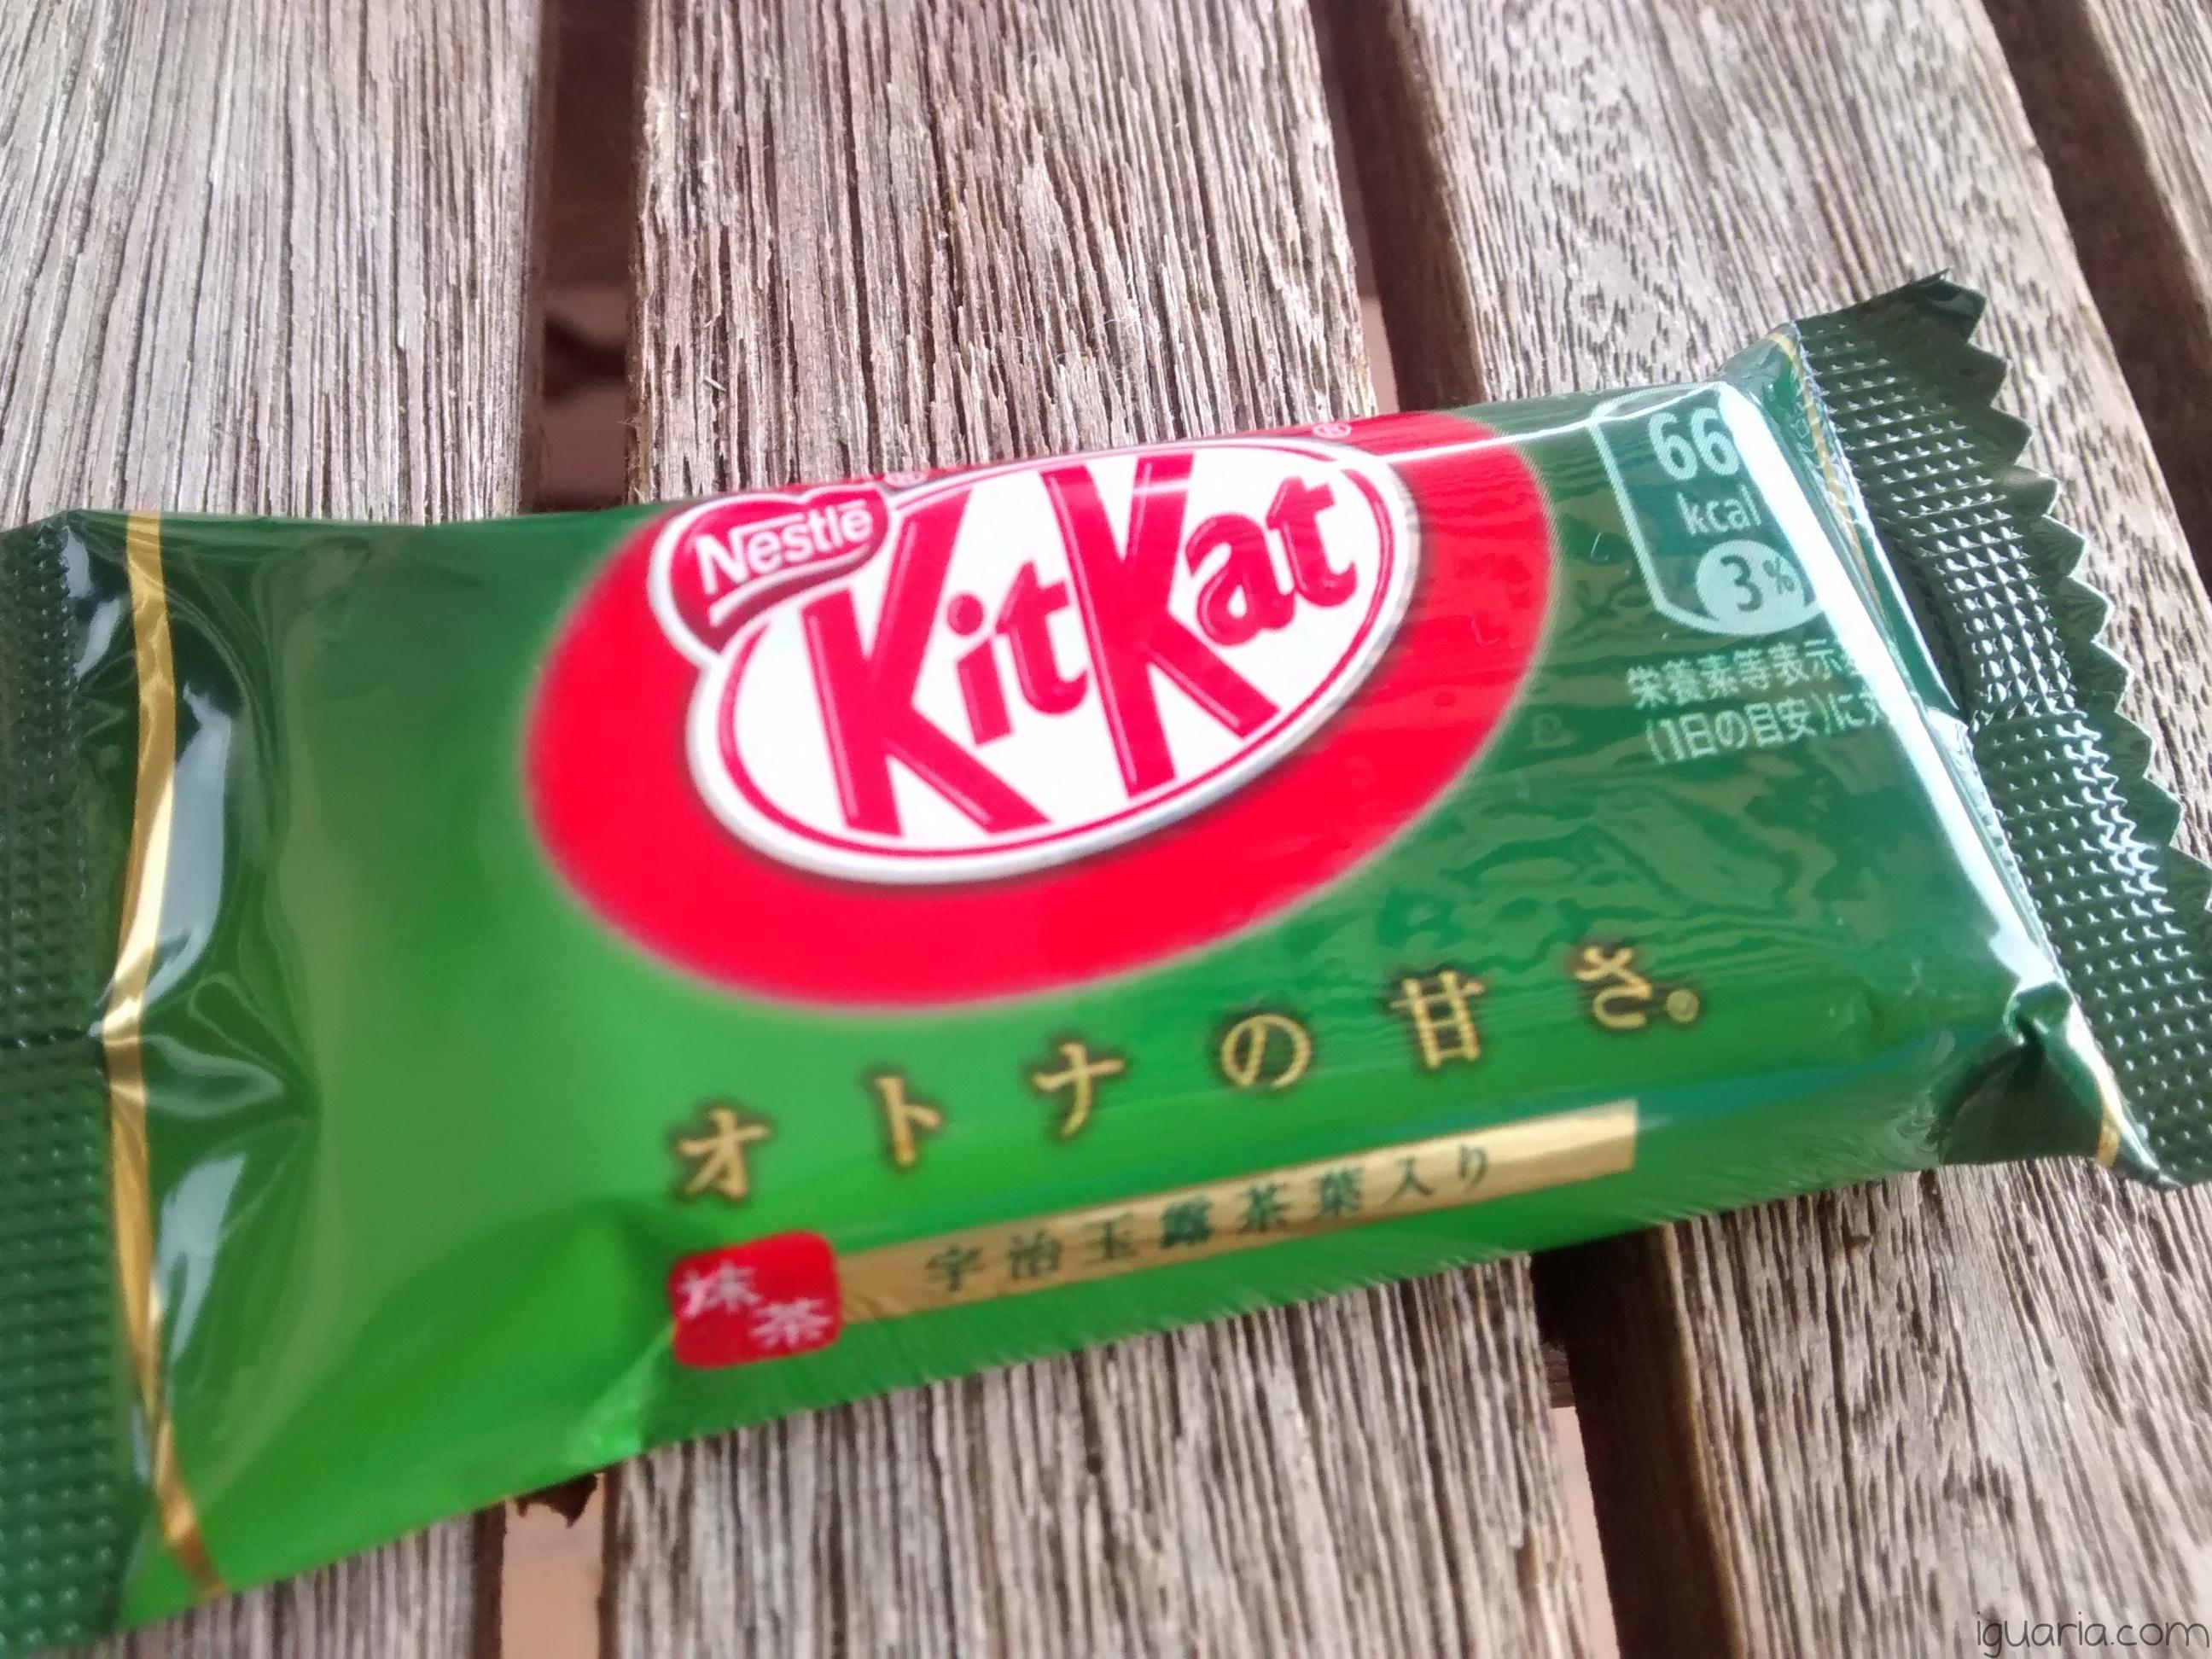 iguaria-kit-kat-com-cha-verde-japones